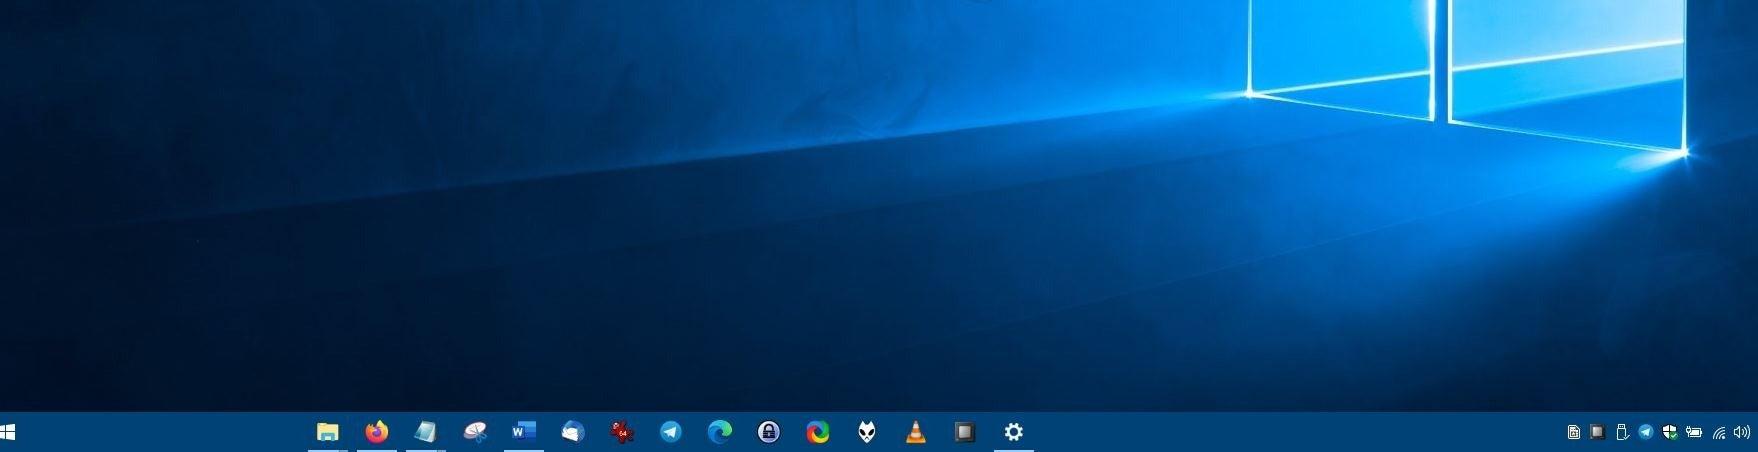 CenterTaskbar - después de desactivar la segunda pantalla